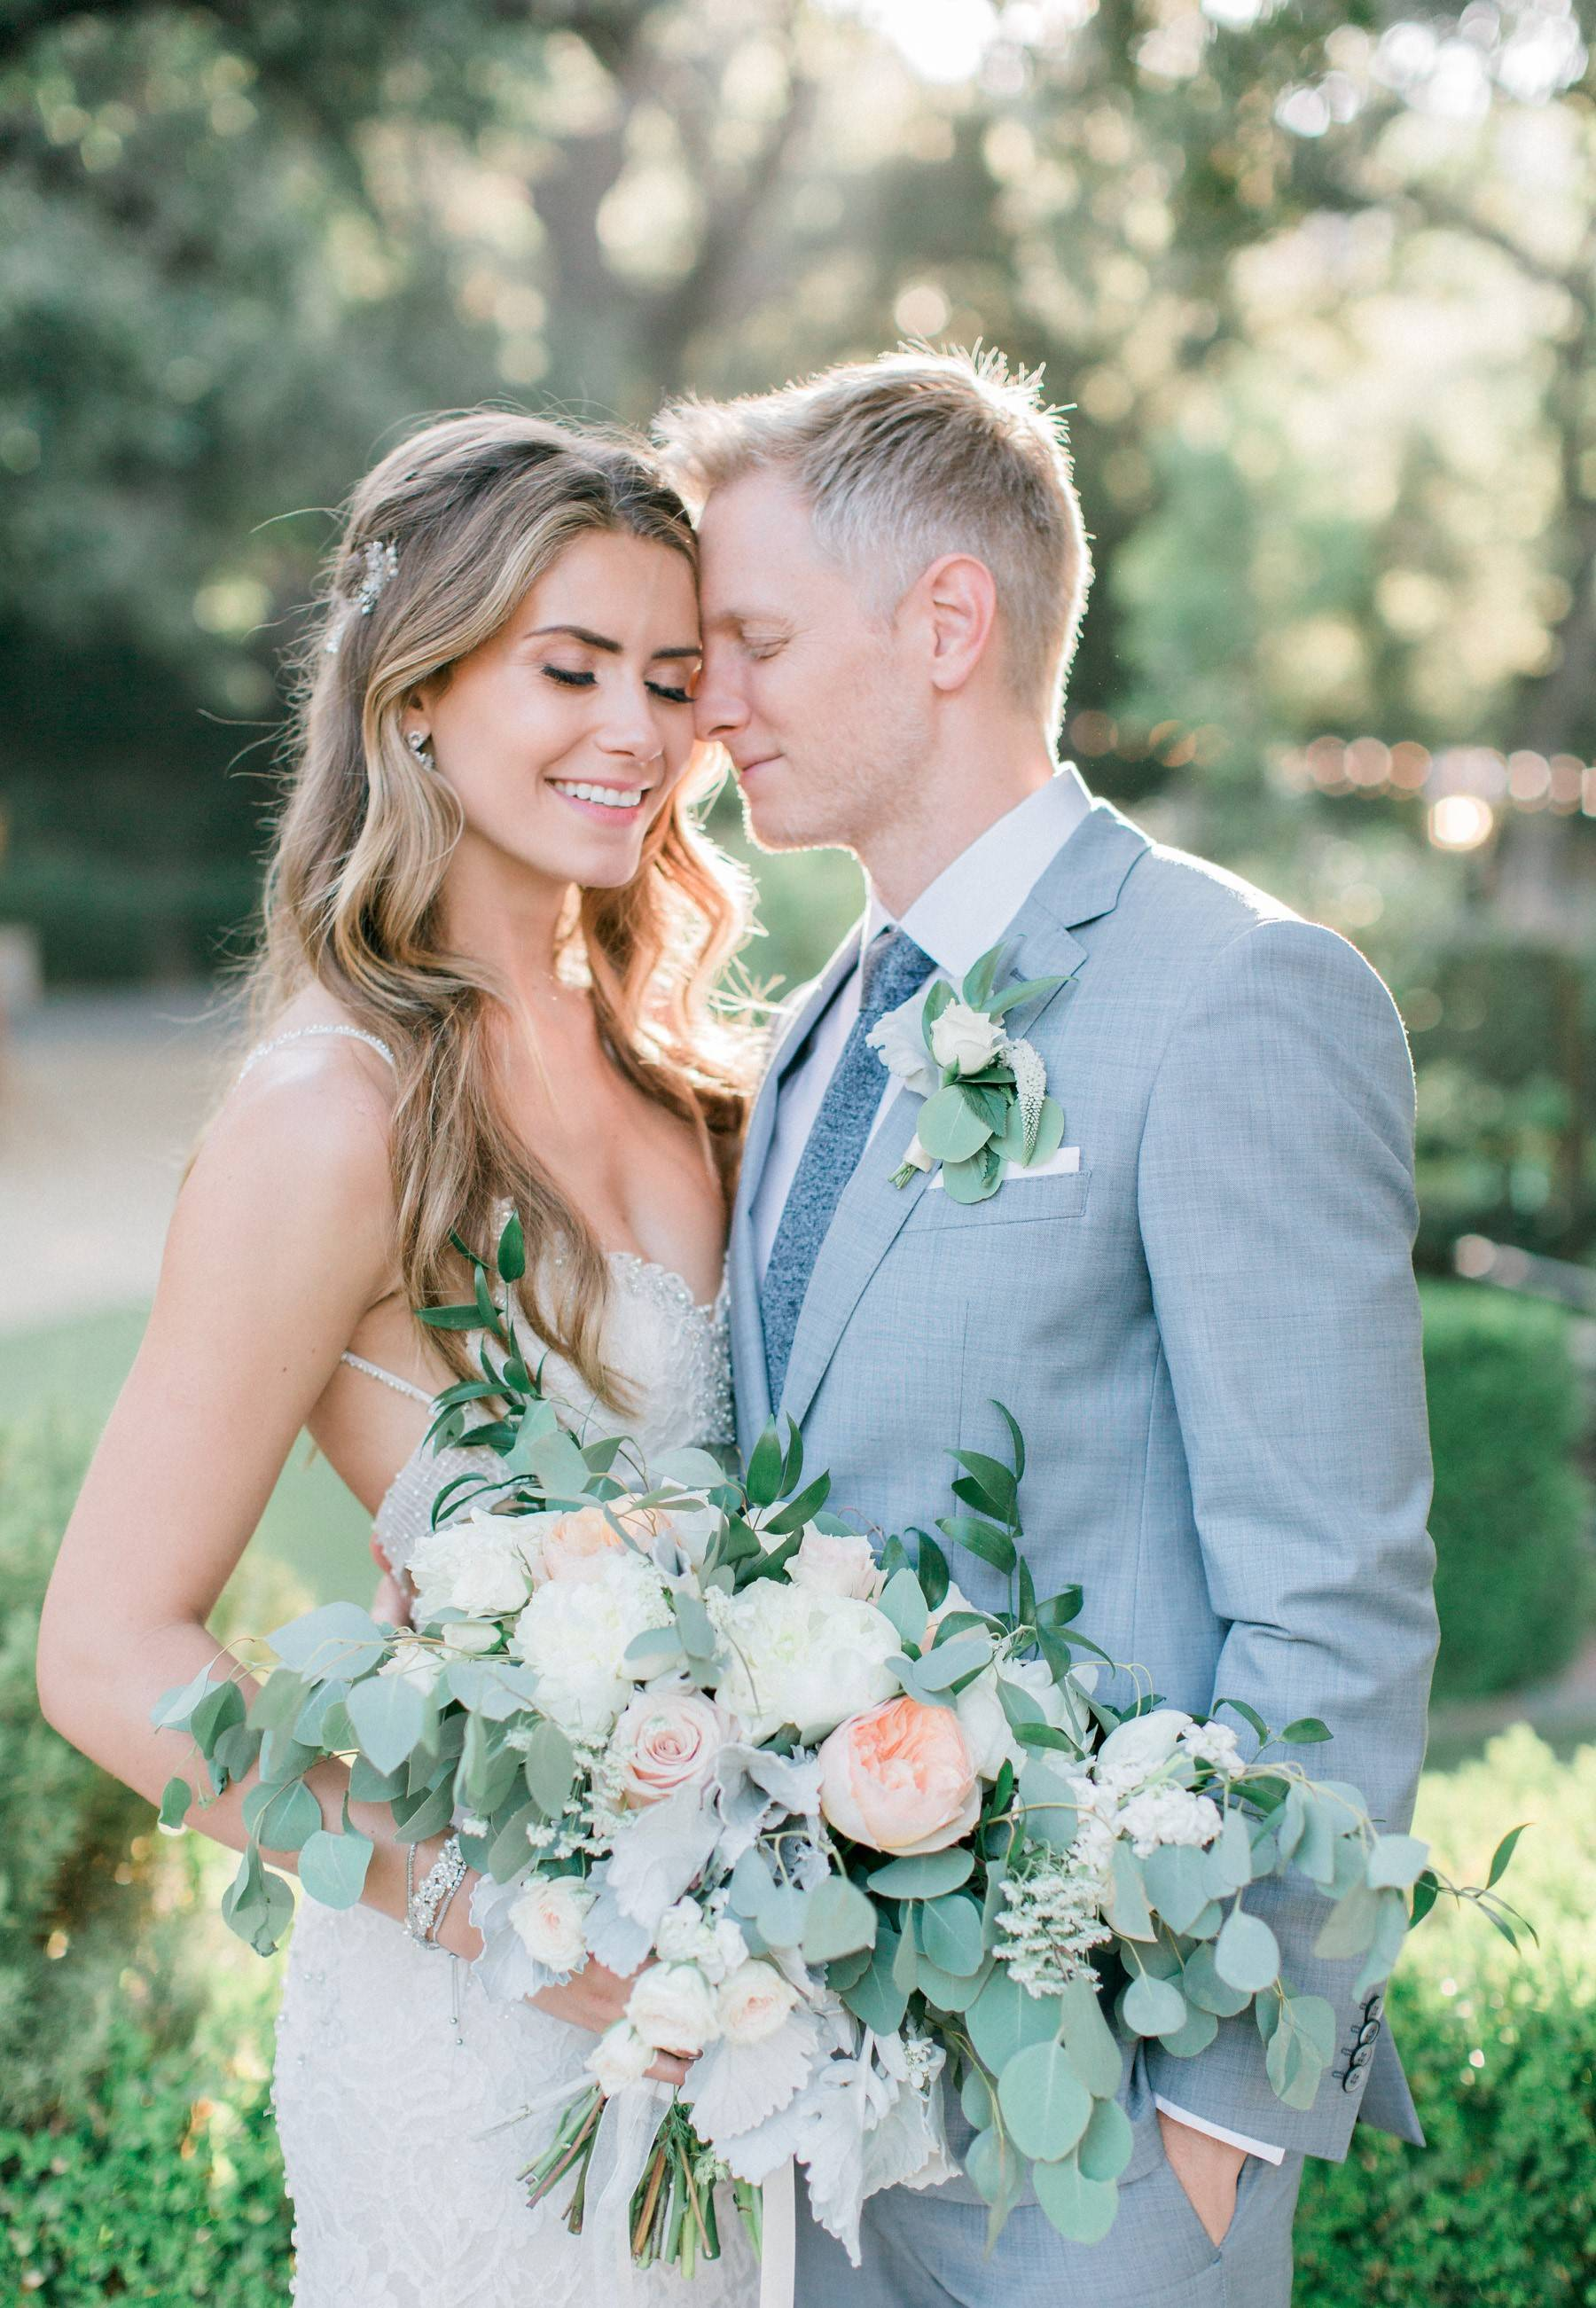 Bohemian wedding, romantic bridal bouquet, lush wedding, Los Angeles florist, Vave